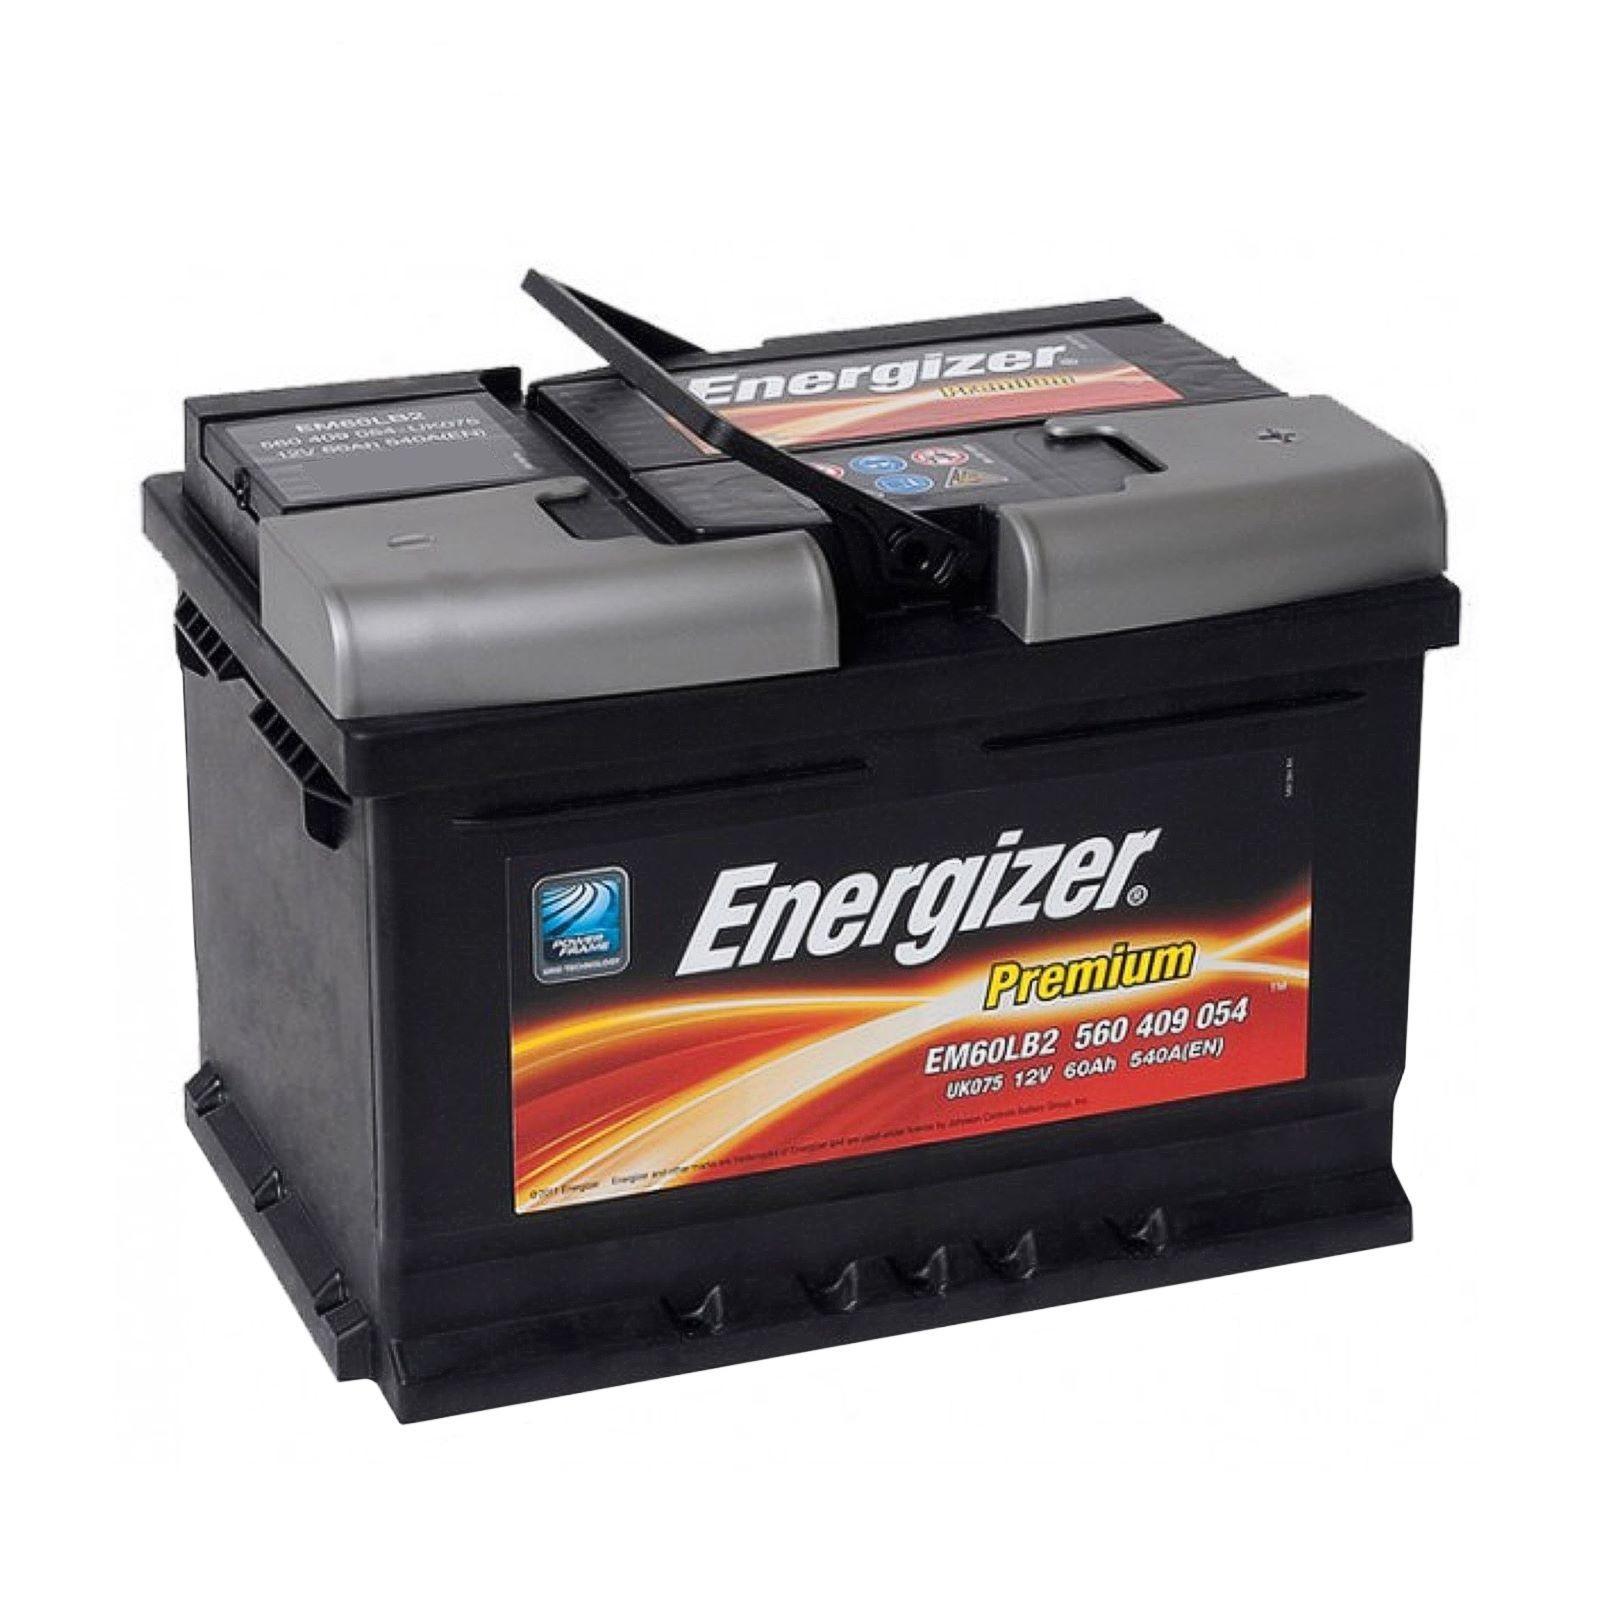 Аккумулятор Energizer EM60LB2, арт. 560409054